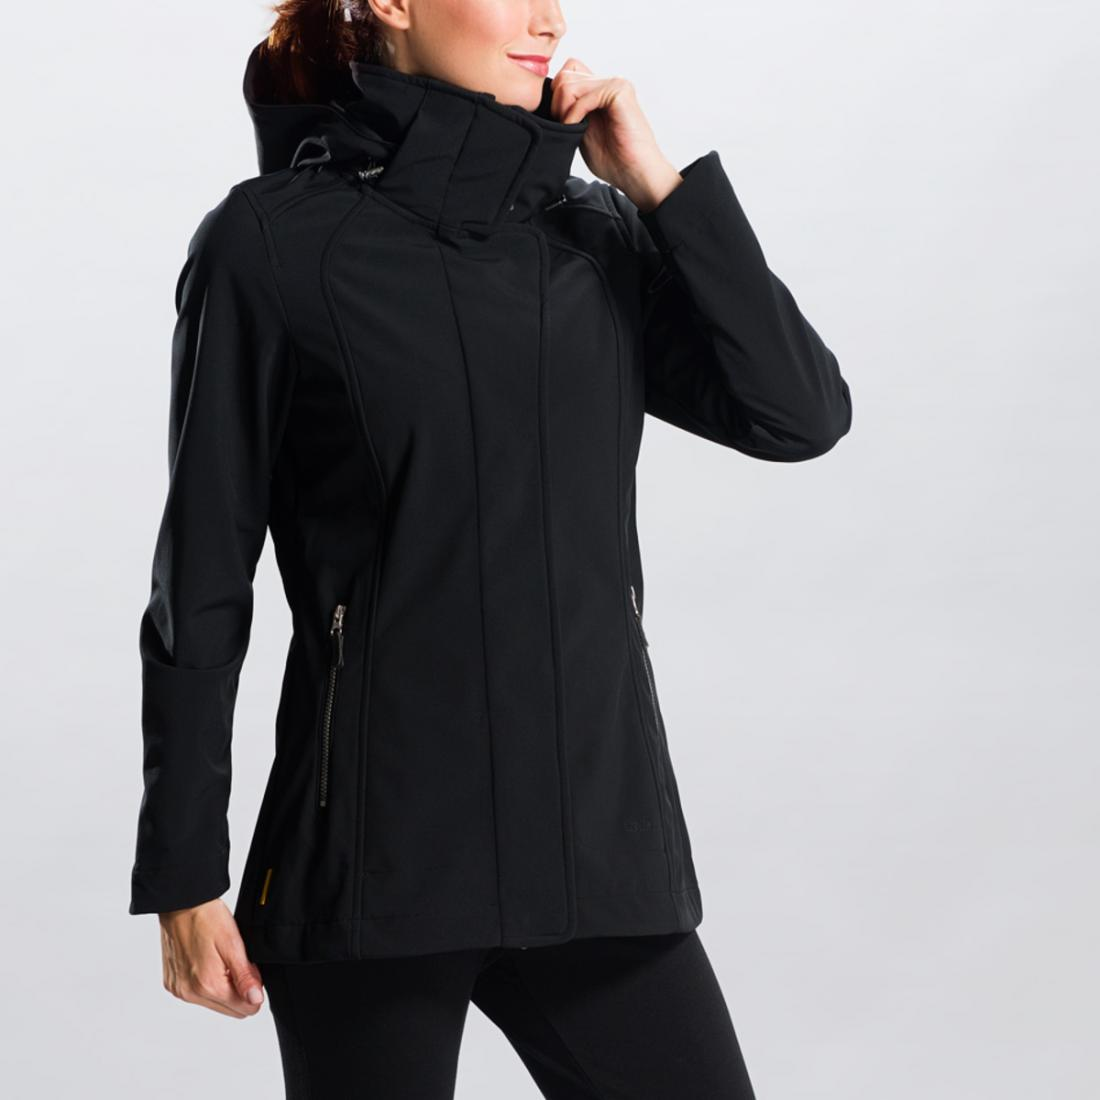 Lole Куртка LUW0191 Stunning Jacket Черный lole капри lsw1949 run capris s twilight blue